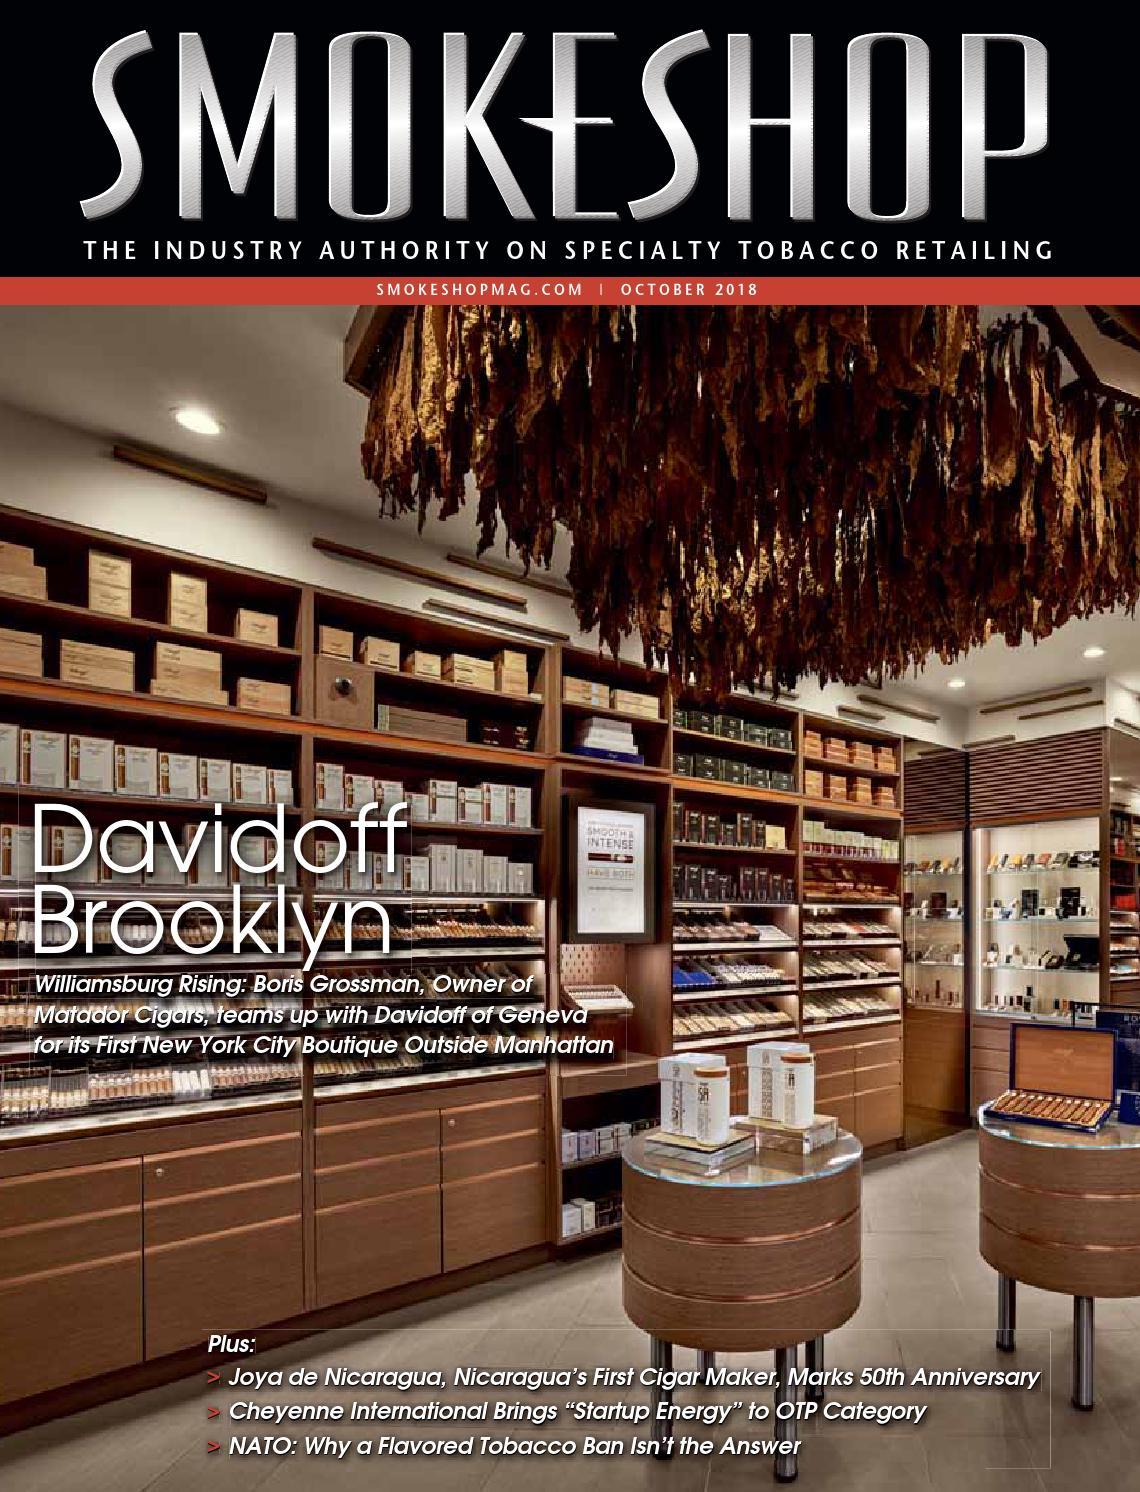 Smokeshop Magazine – October 2018 by Smokeshop Magazine - issuu